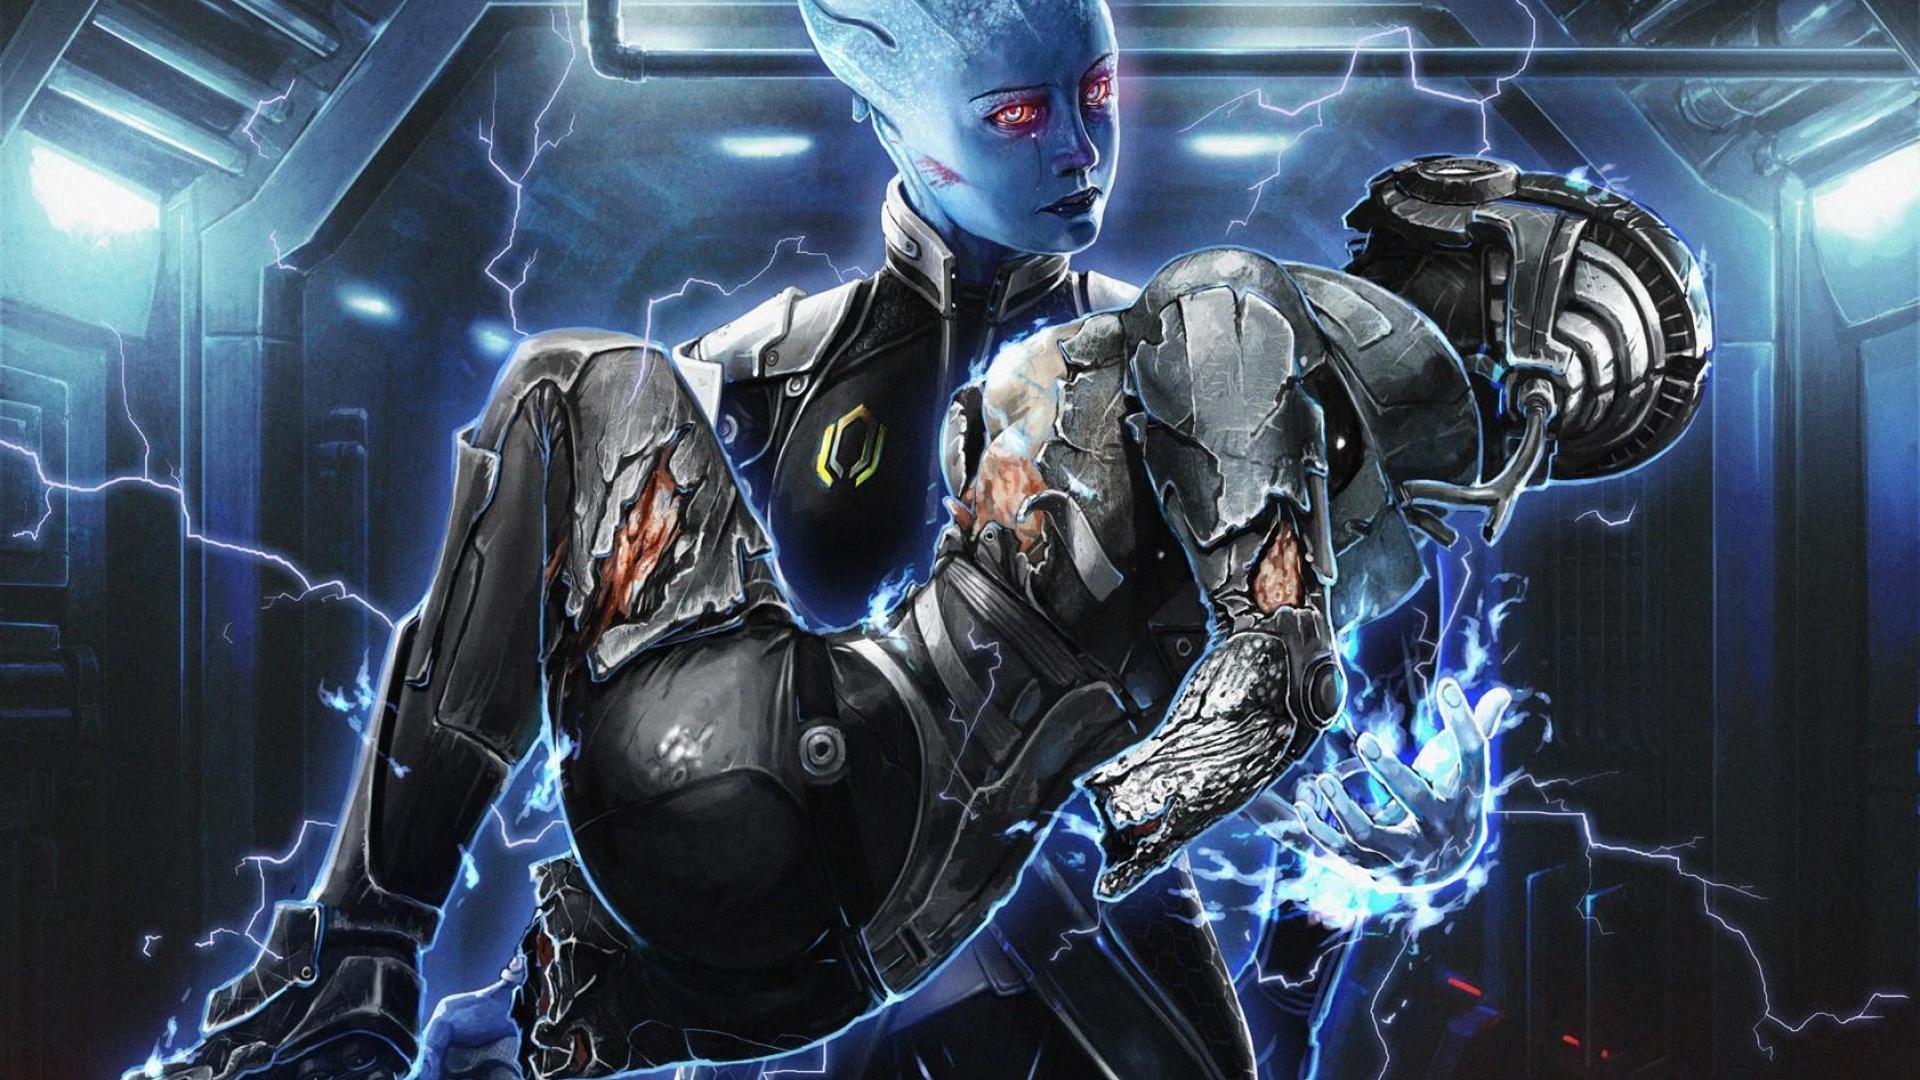 Mass Effect Andromeda. Не коротко о главном. - Изображение 1